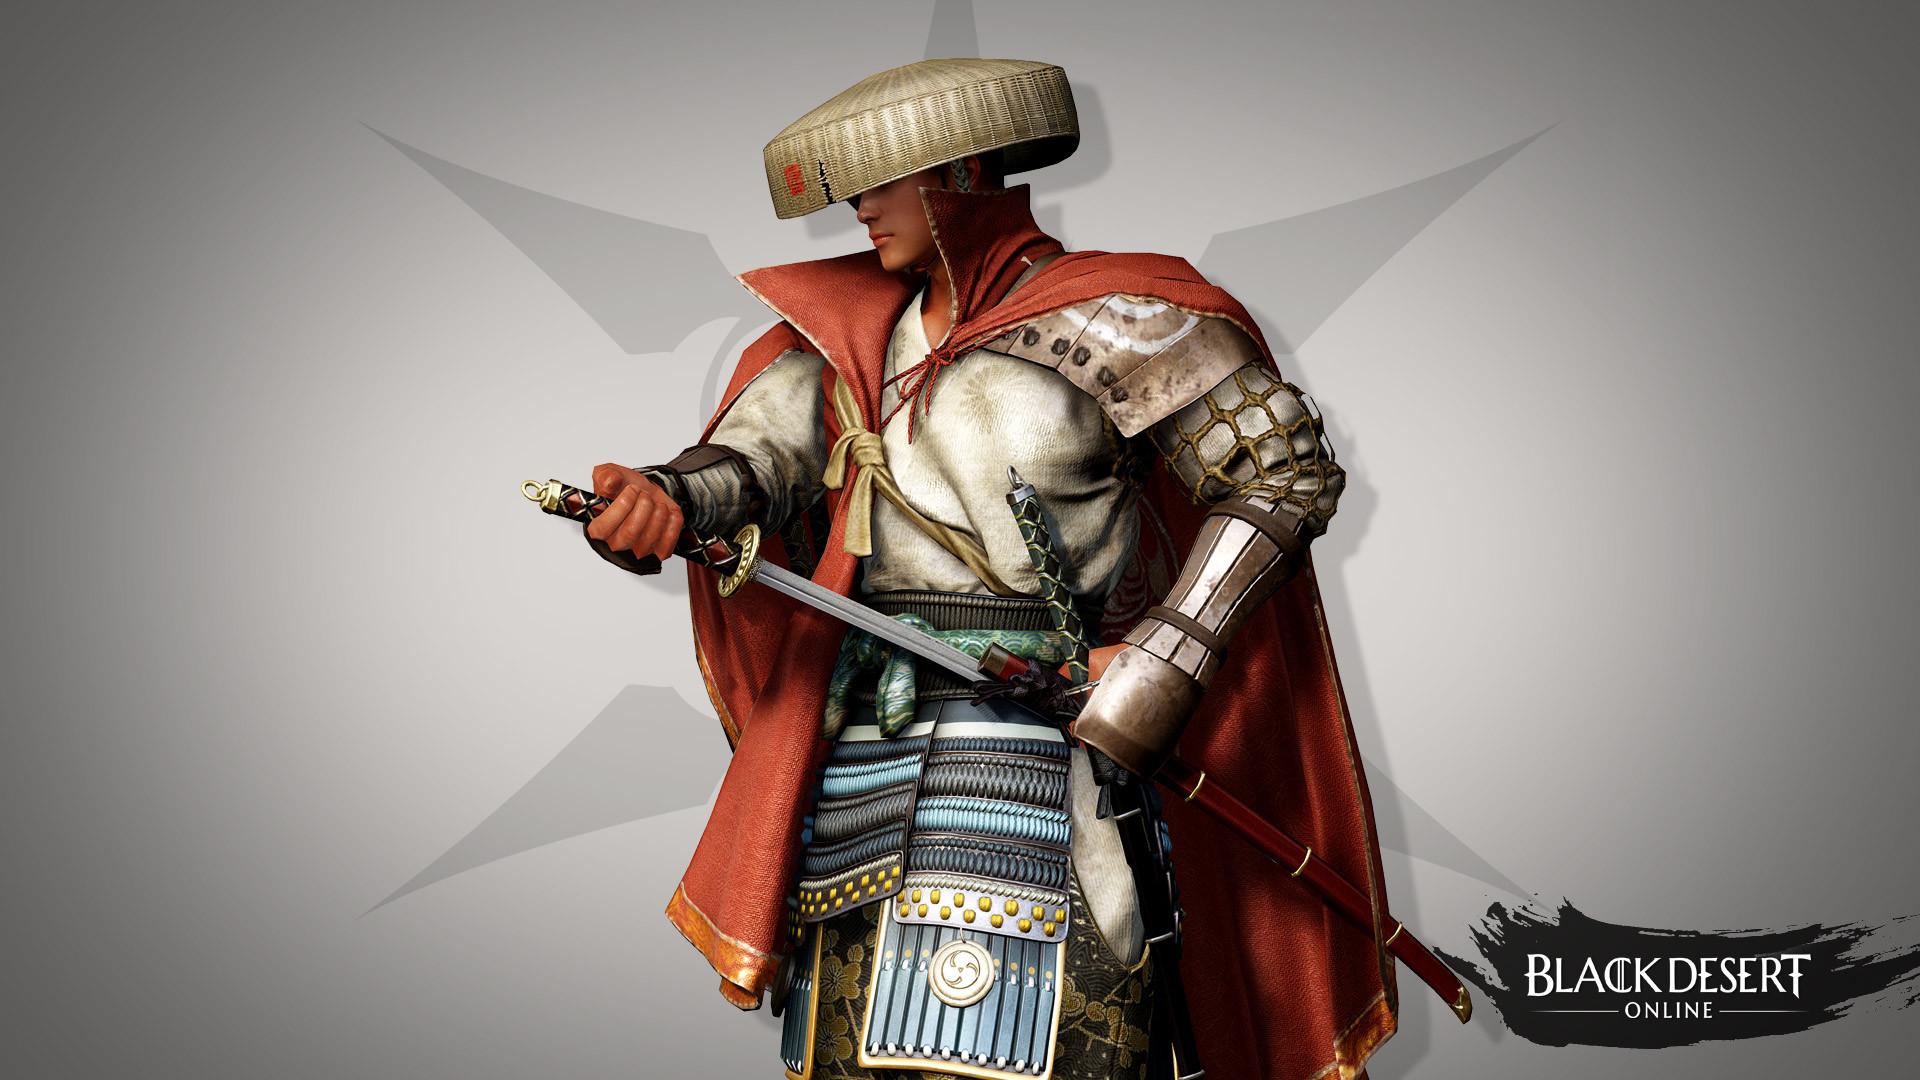 2 Ninja (Black Desert Online) HD Wallpapers | Backgrounds – Wallpaper Abyss